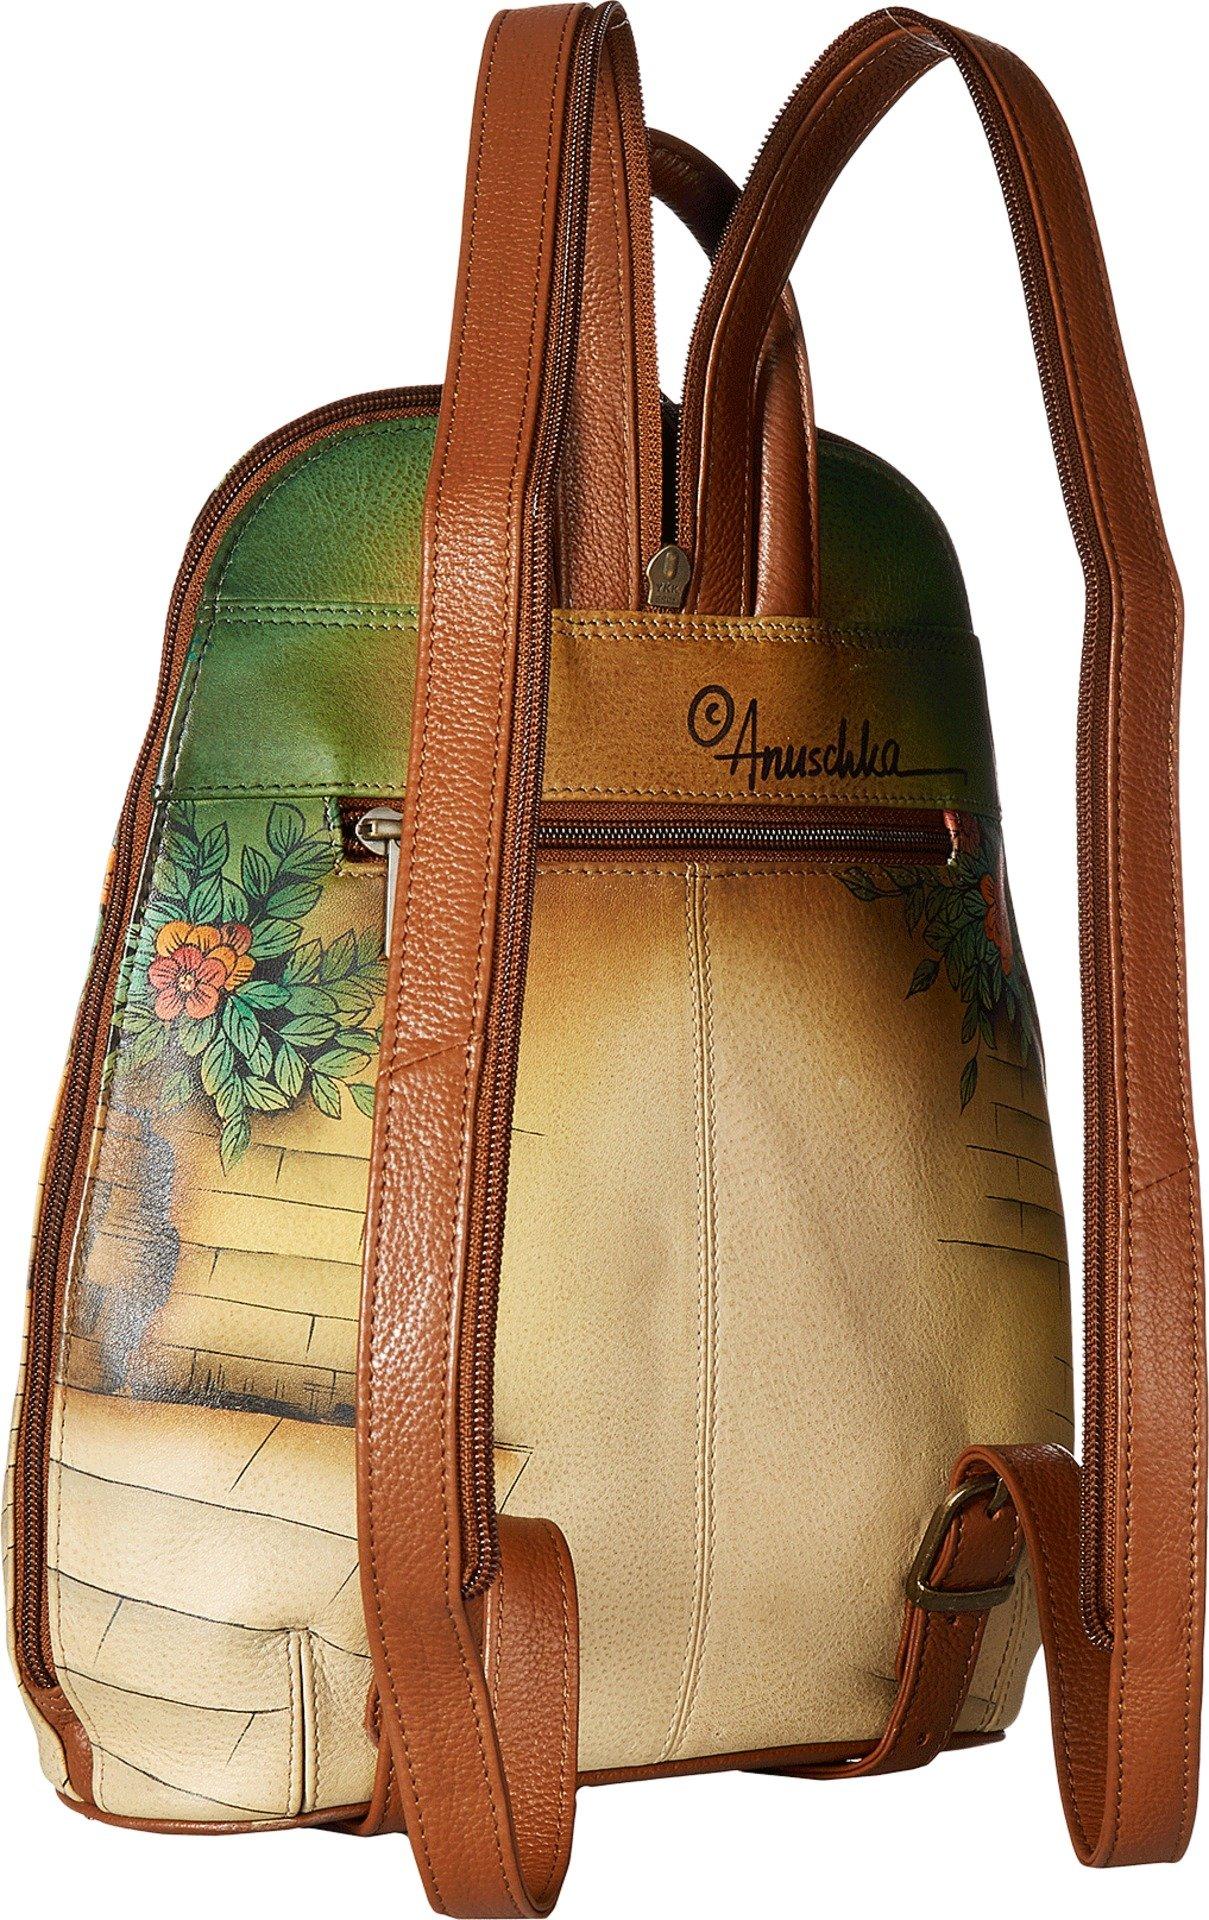 Anuschka Handbags Women's 487 Sling Over Travel Backpack Vintage Bike Handbag by ANUSCHKA (Image #2)